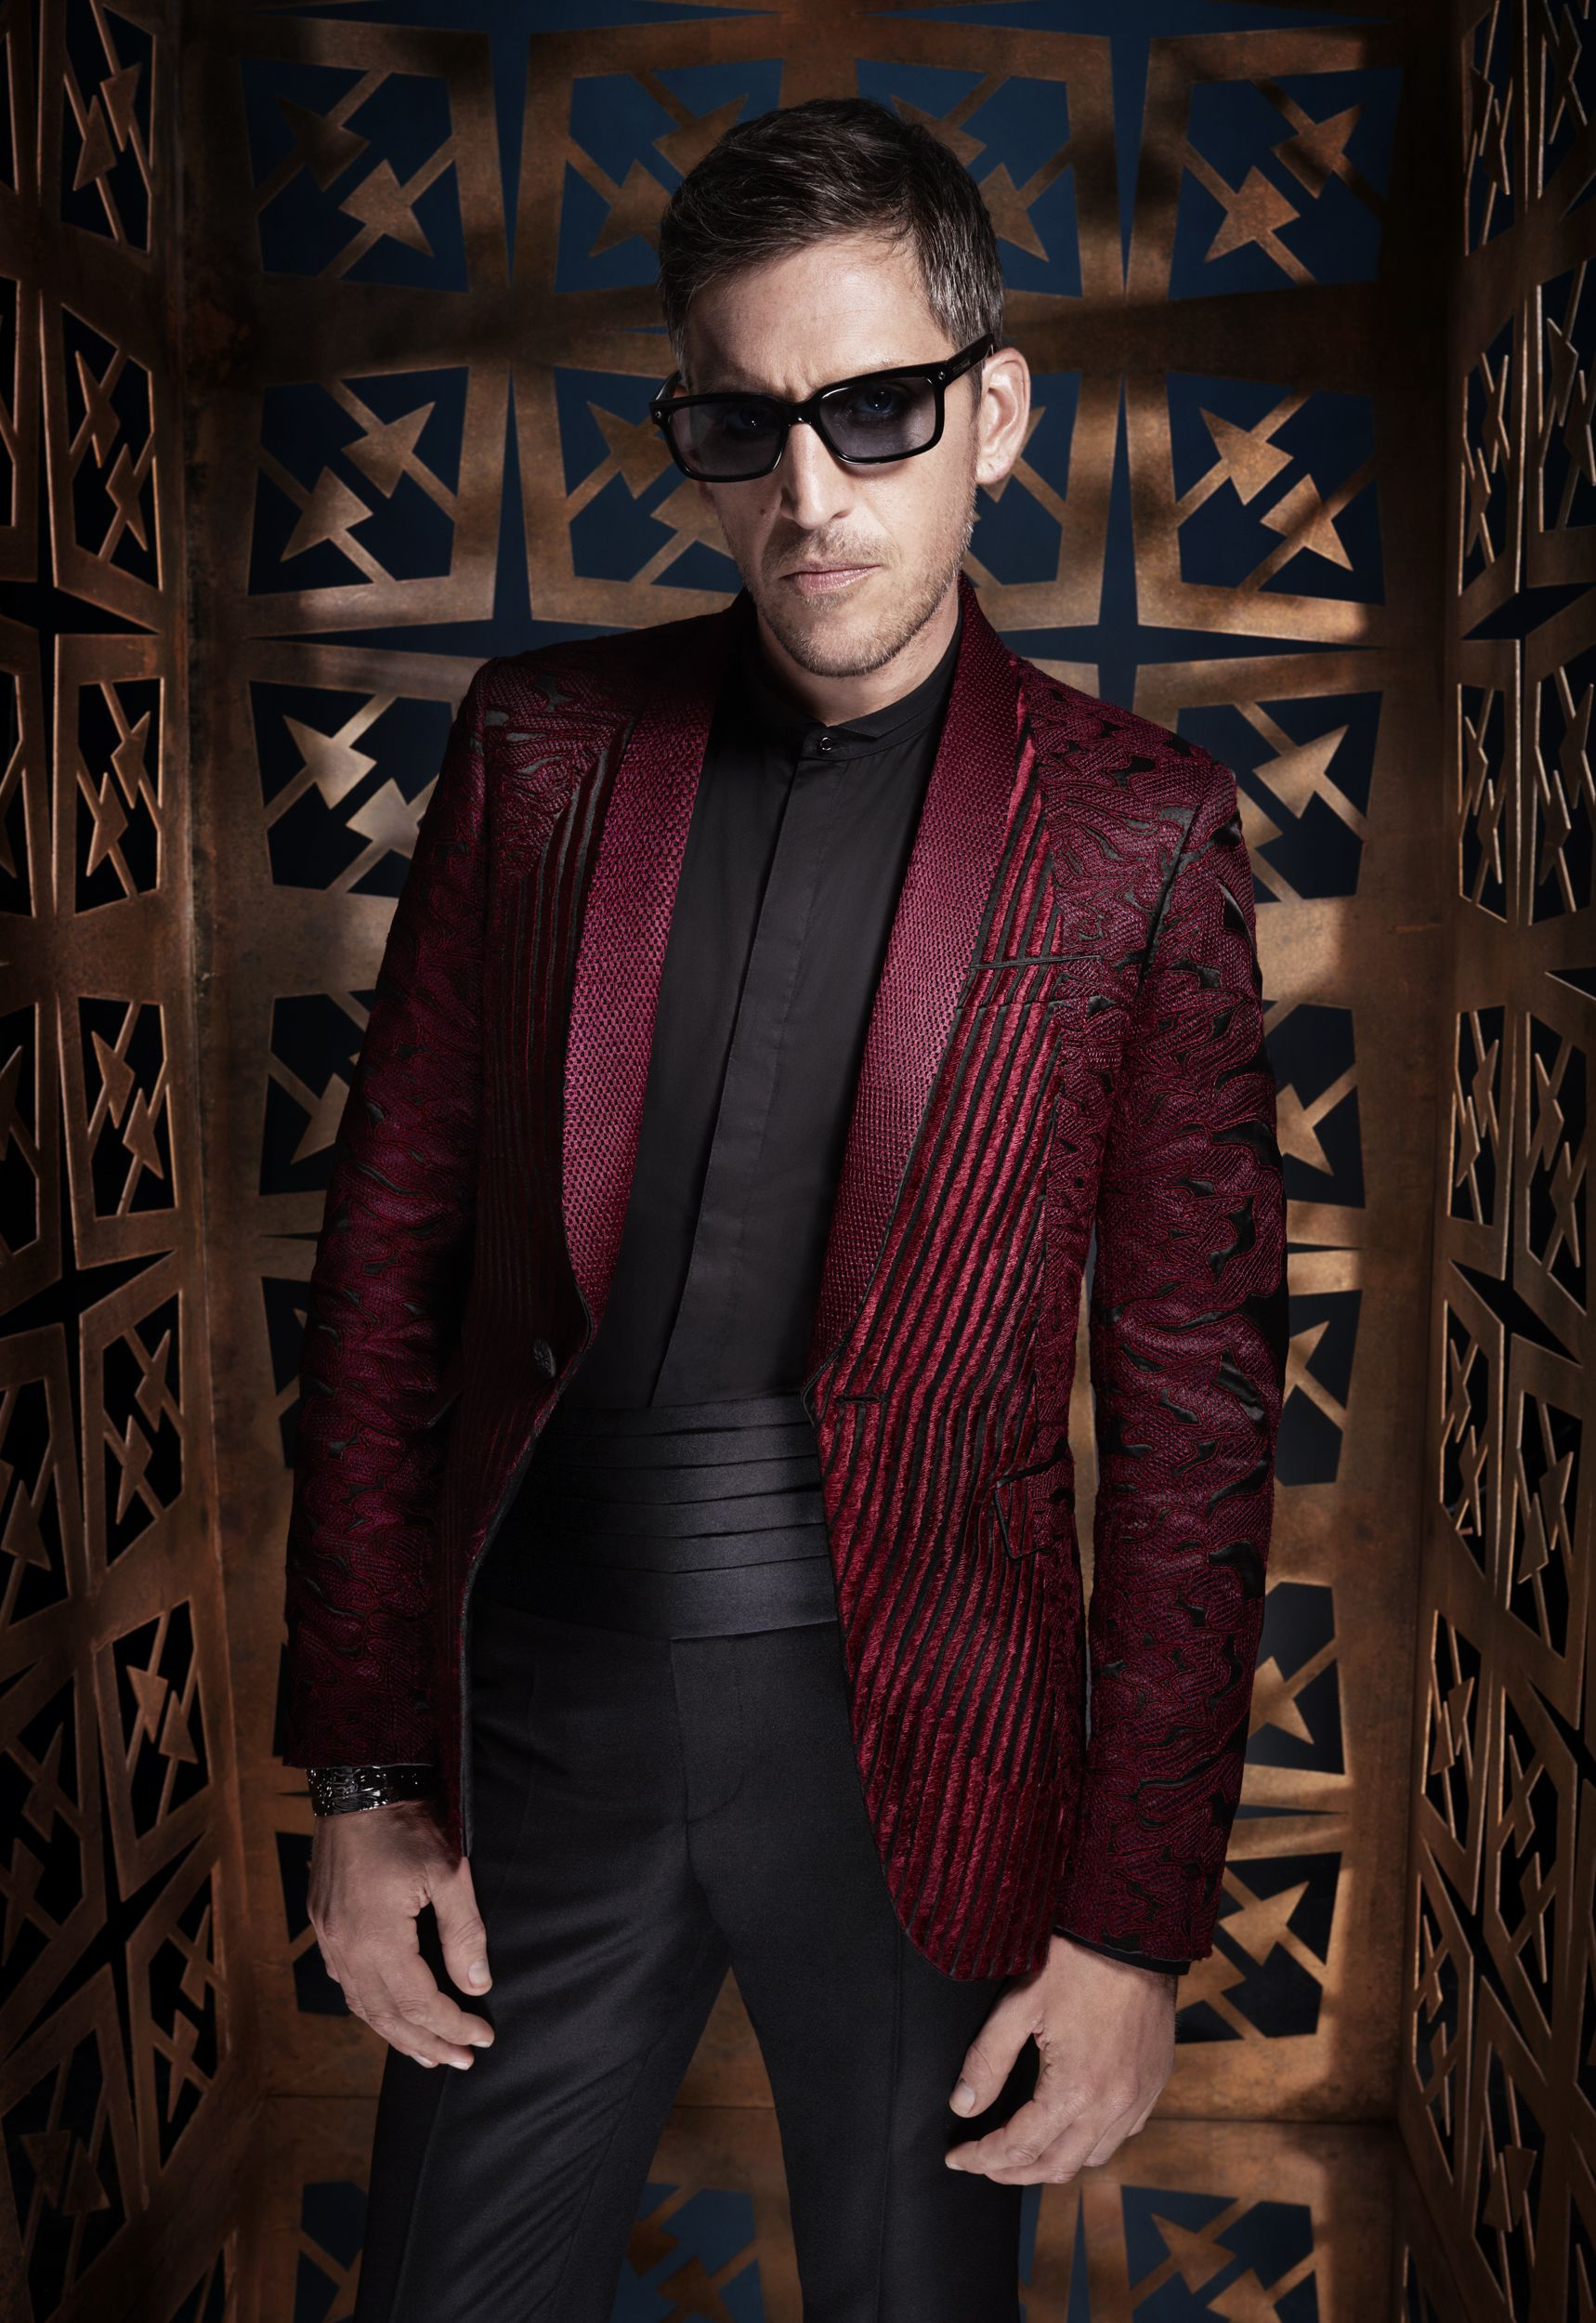 #RobertoCavalli Menswear SS 2014 collection